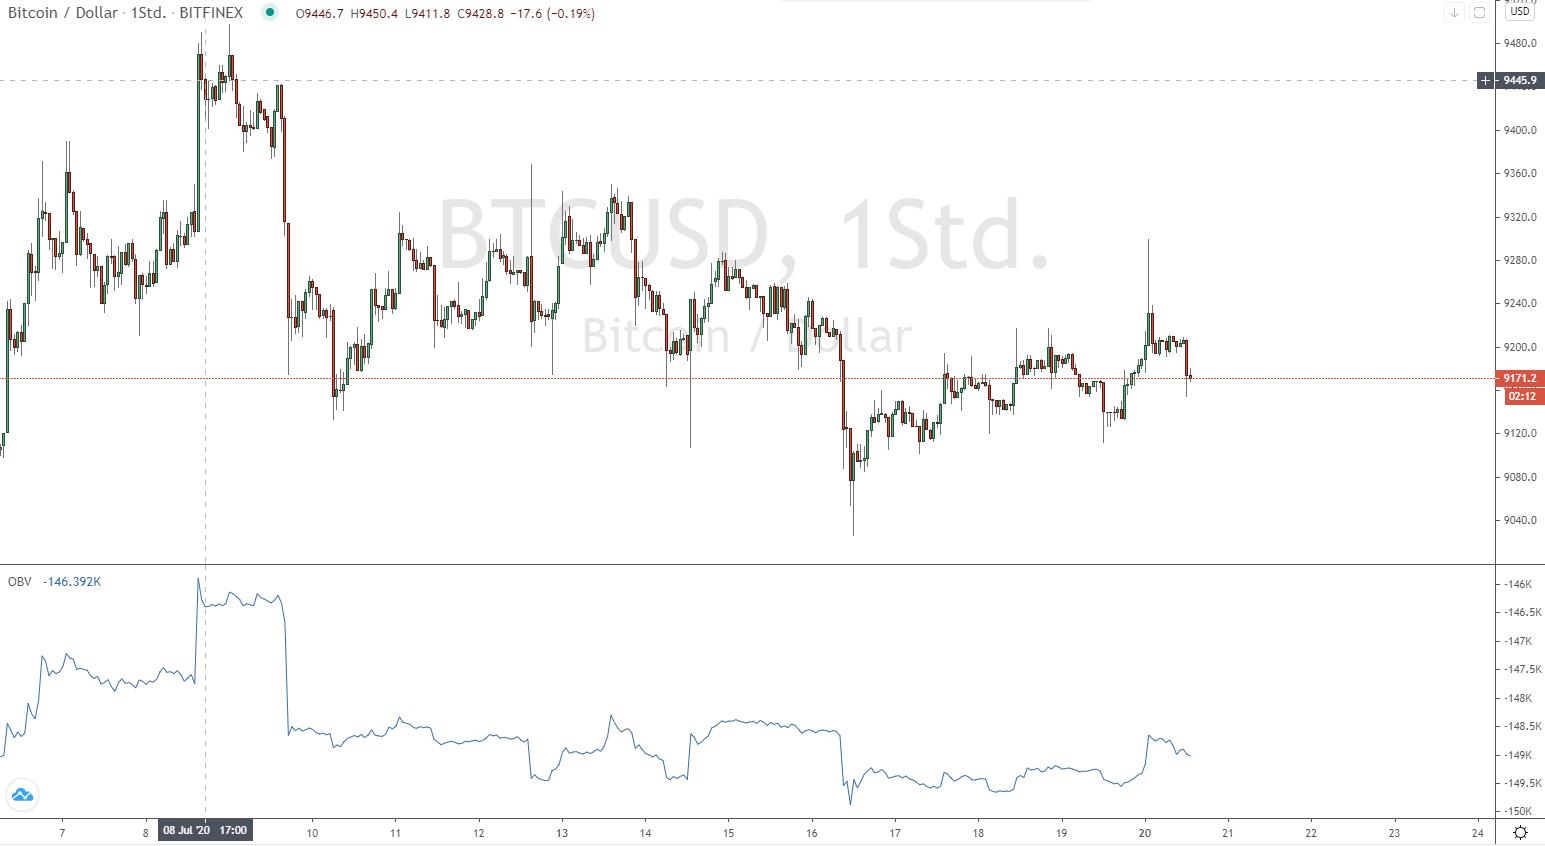 Bitcoin Trading mit OBV Indikator